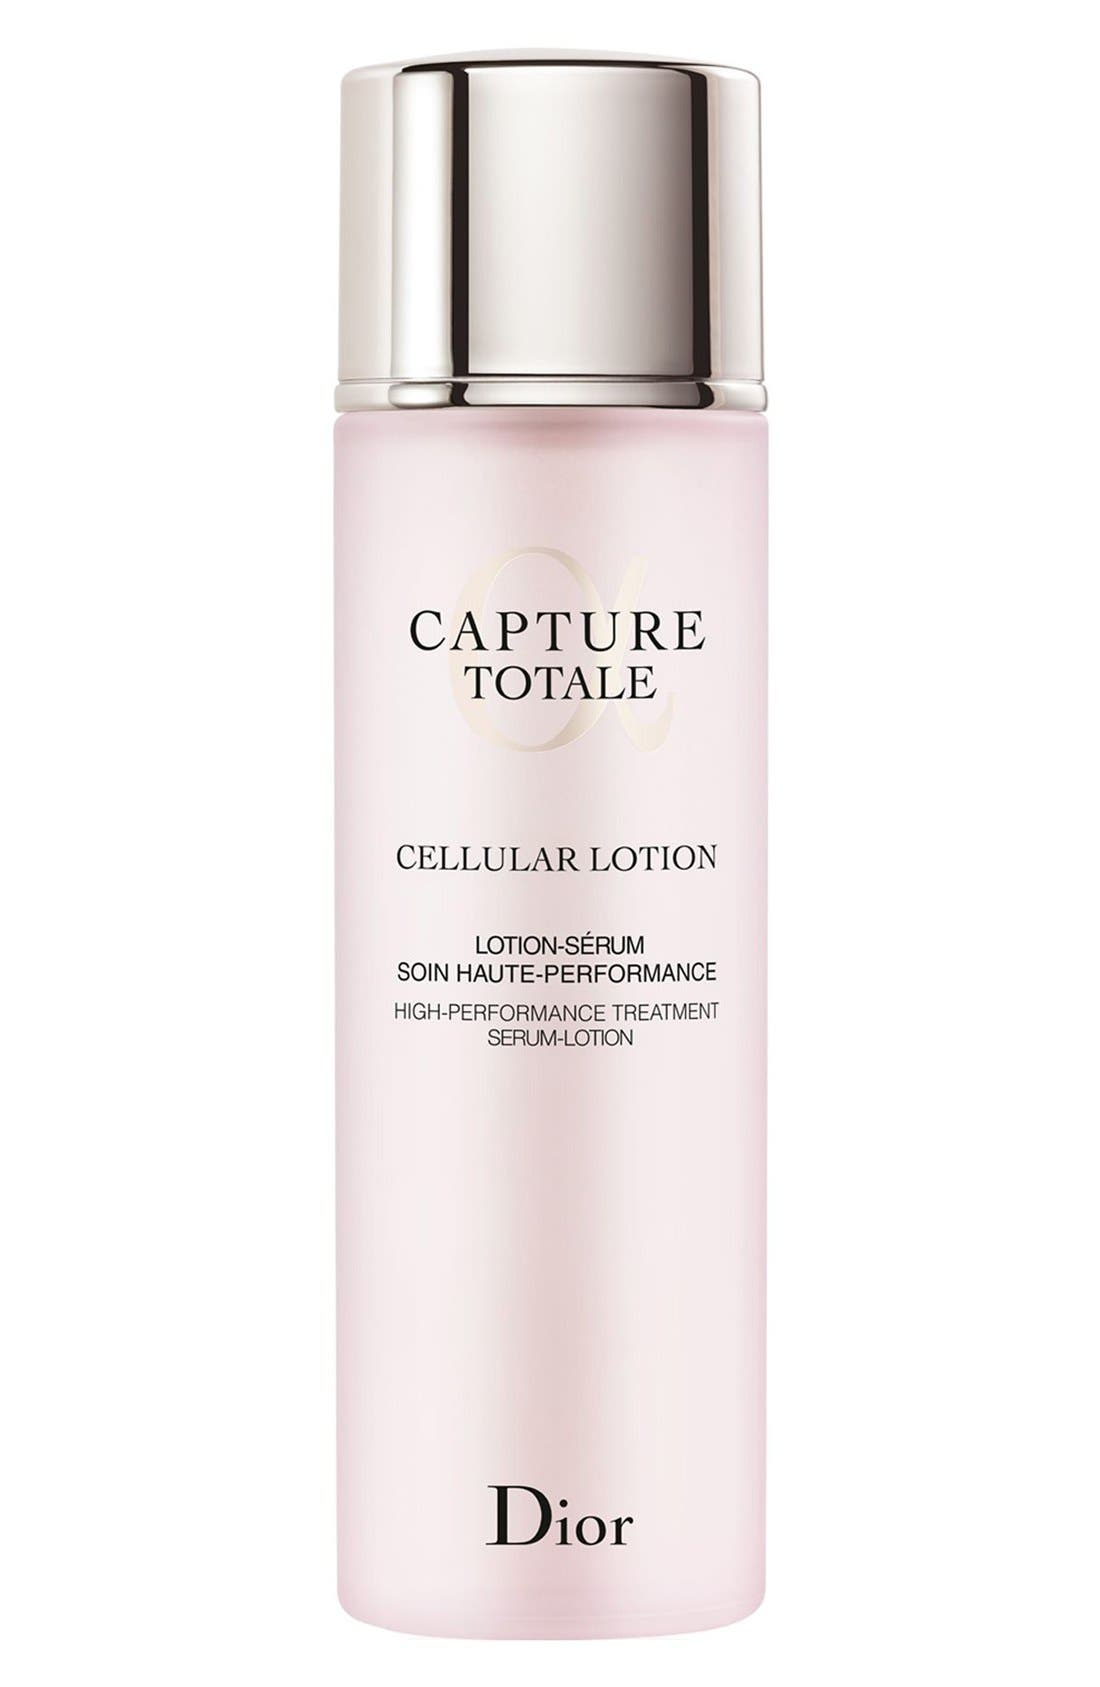 Dior 'Capture Totale' Cellular Lotion